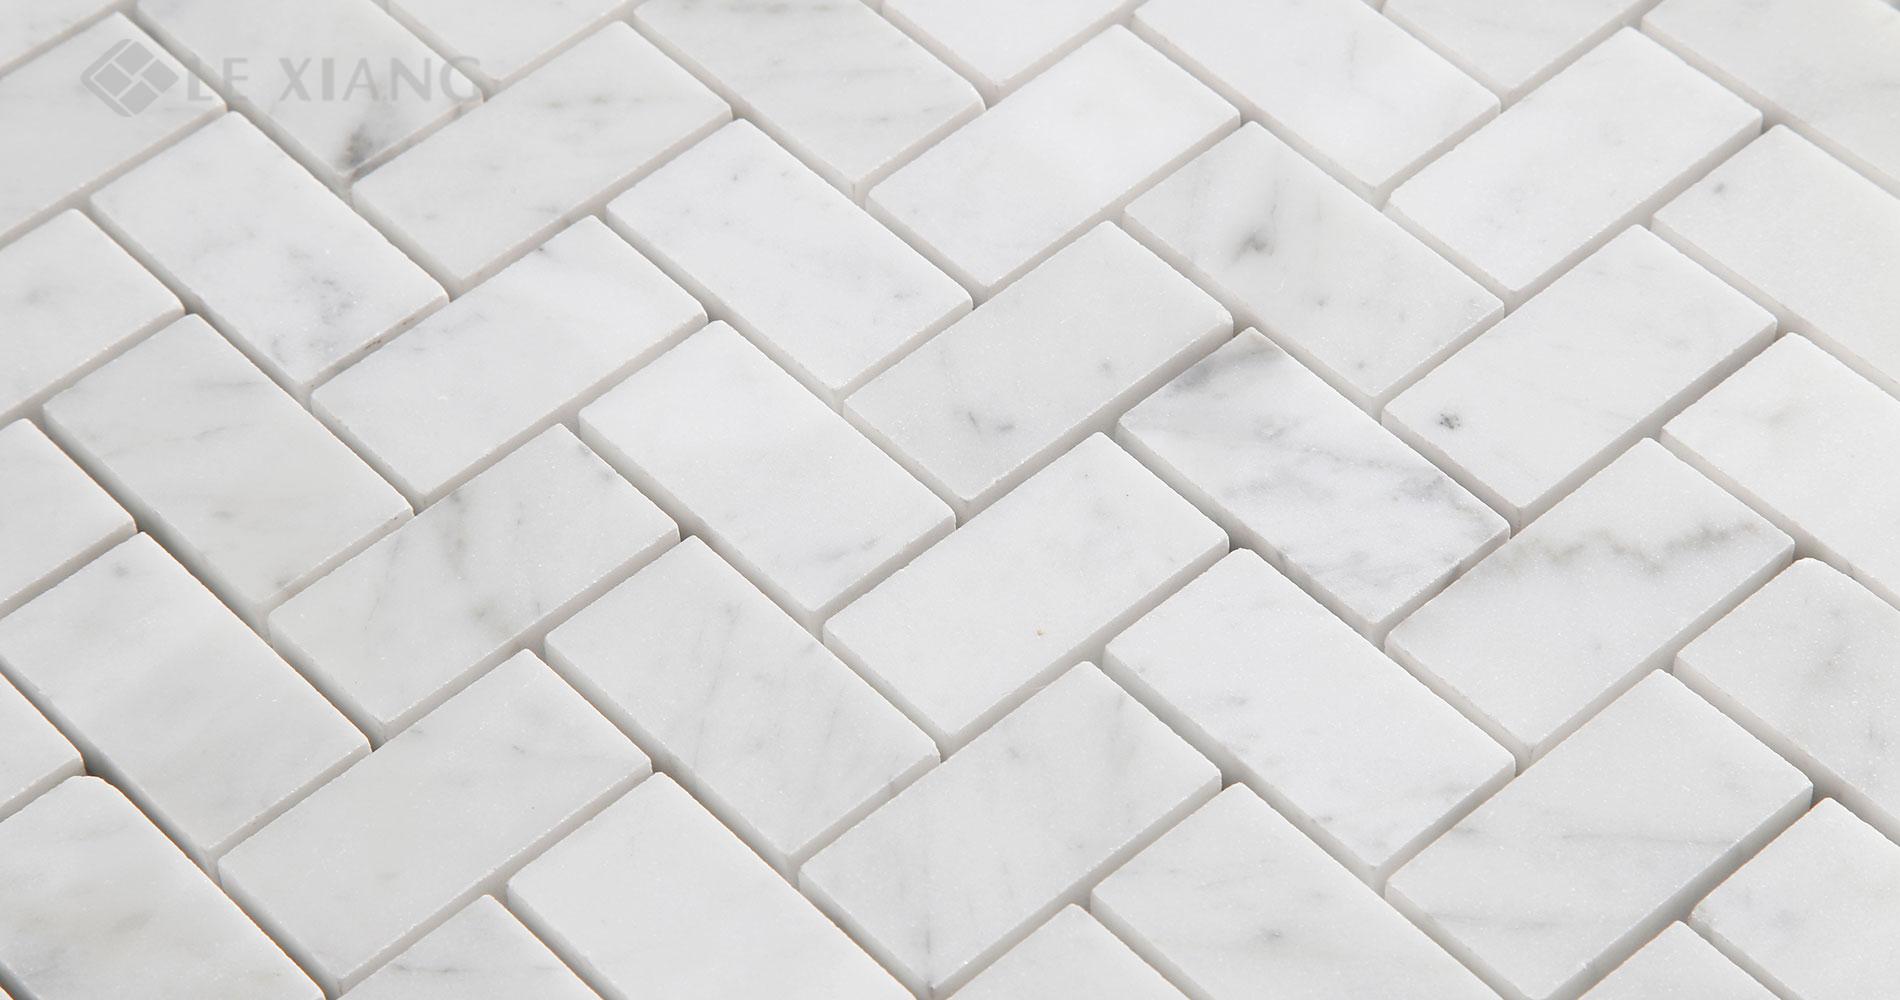 Carrara Herringbone Stone Mosaic Tiles For Bathroom Floors 5